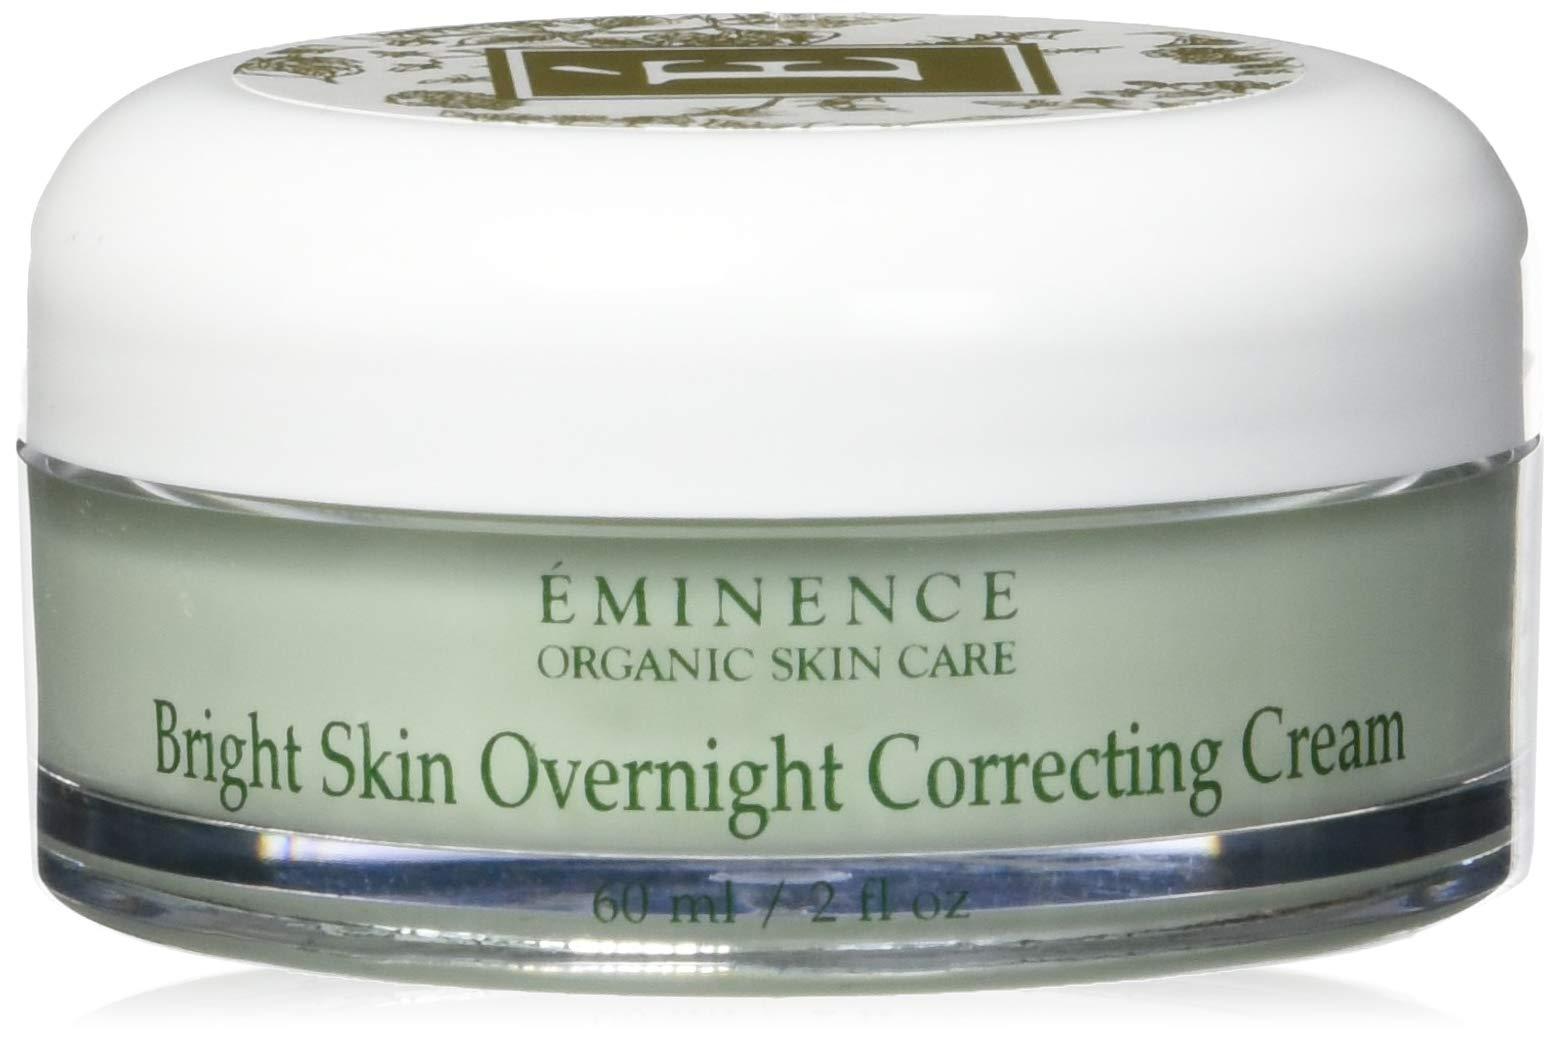 Eminence Bright Skin Overnight Correcting Cream, 2 Ounce